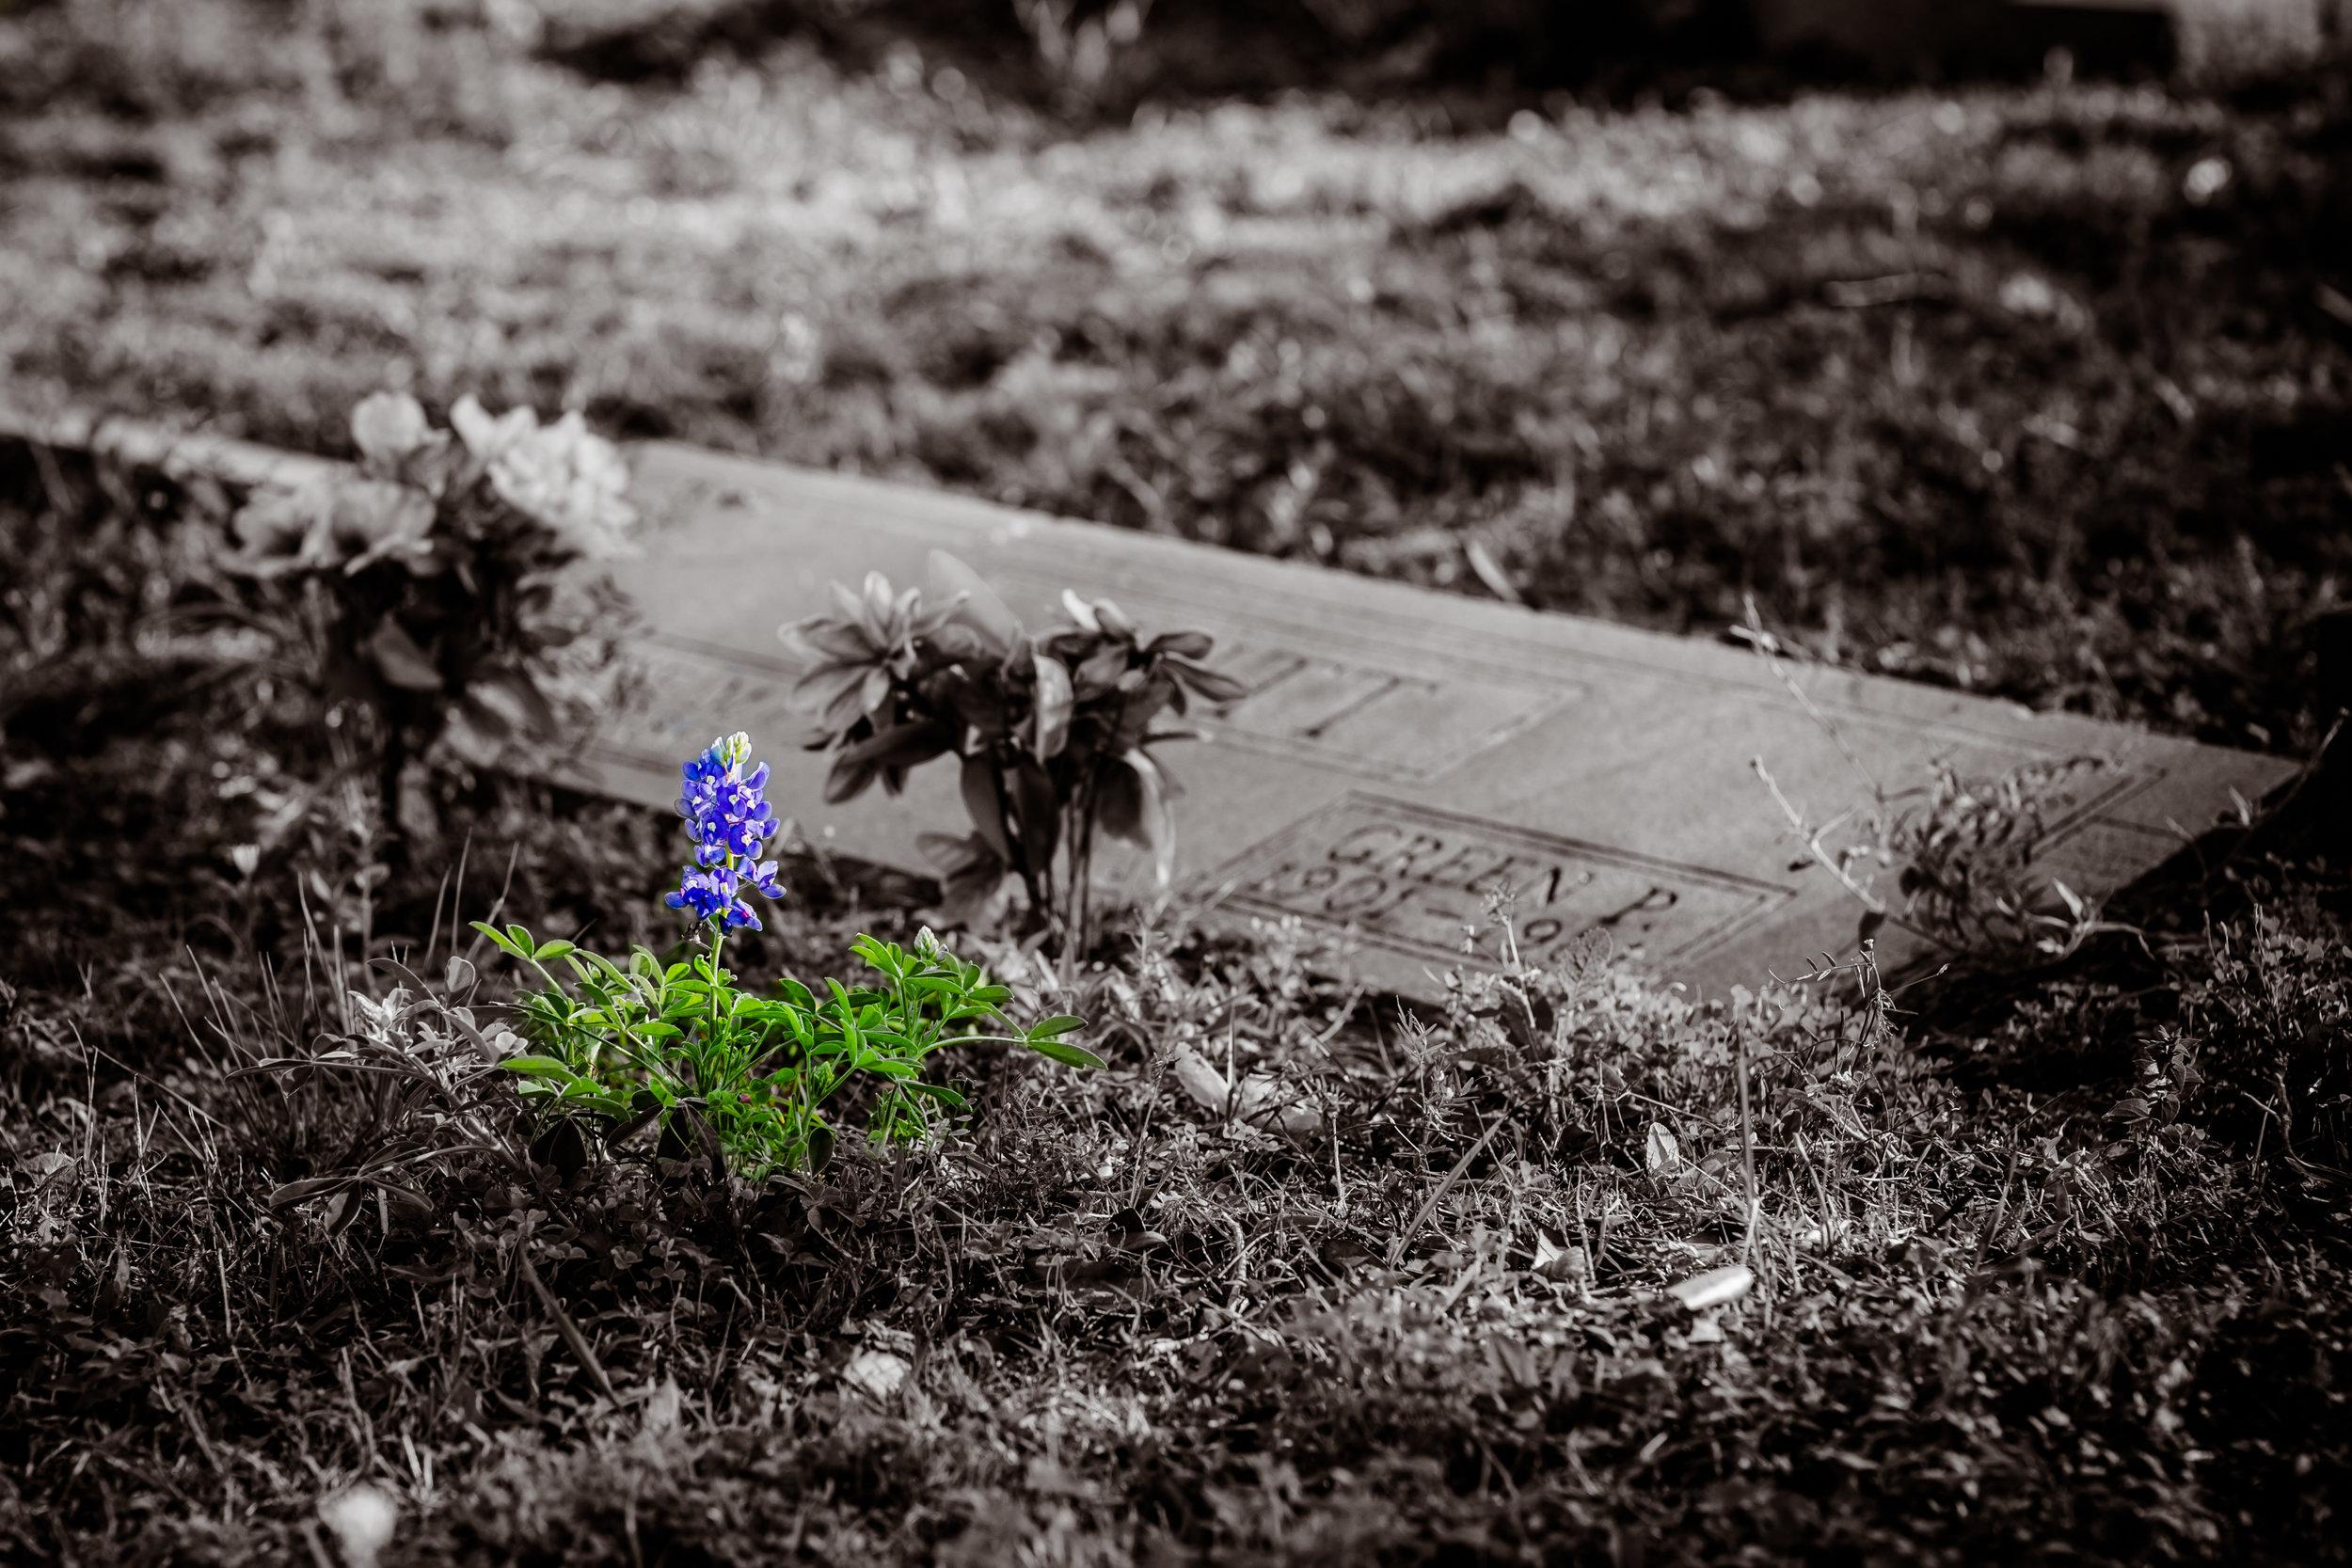 bb cemetery no WM - 250.jpg